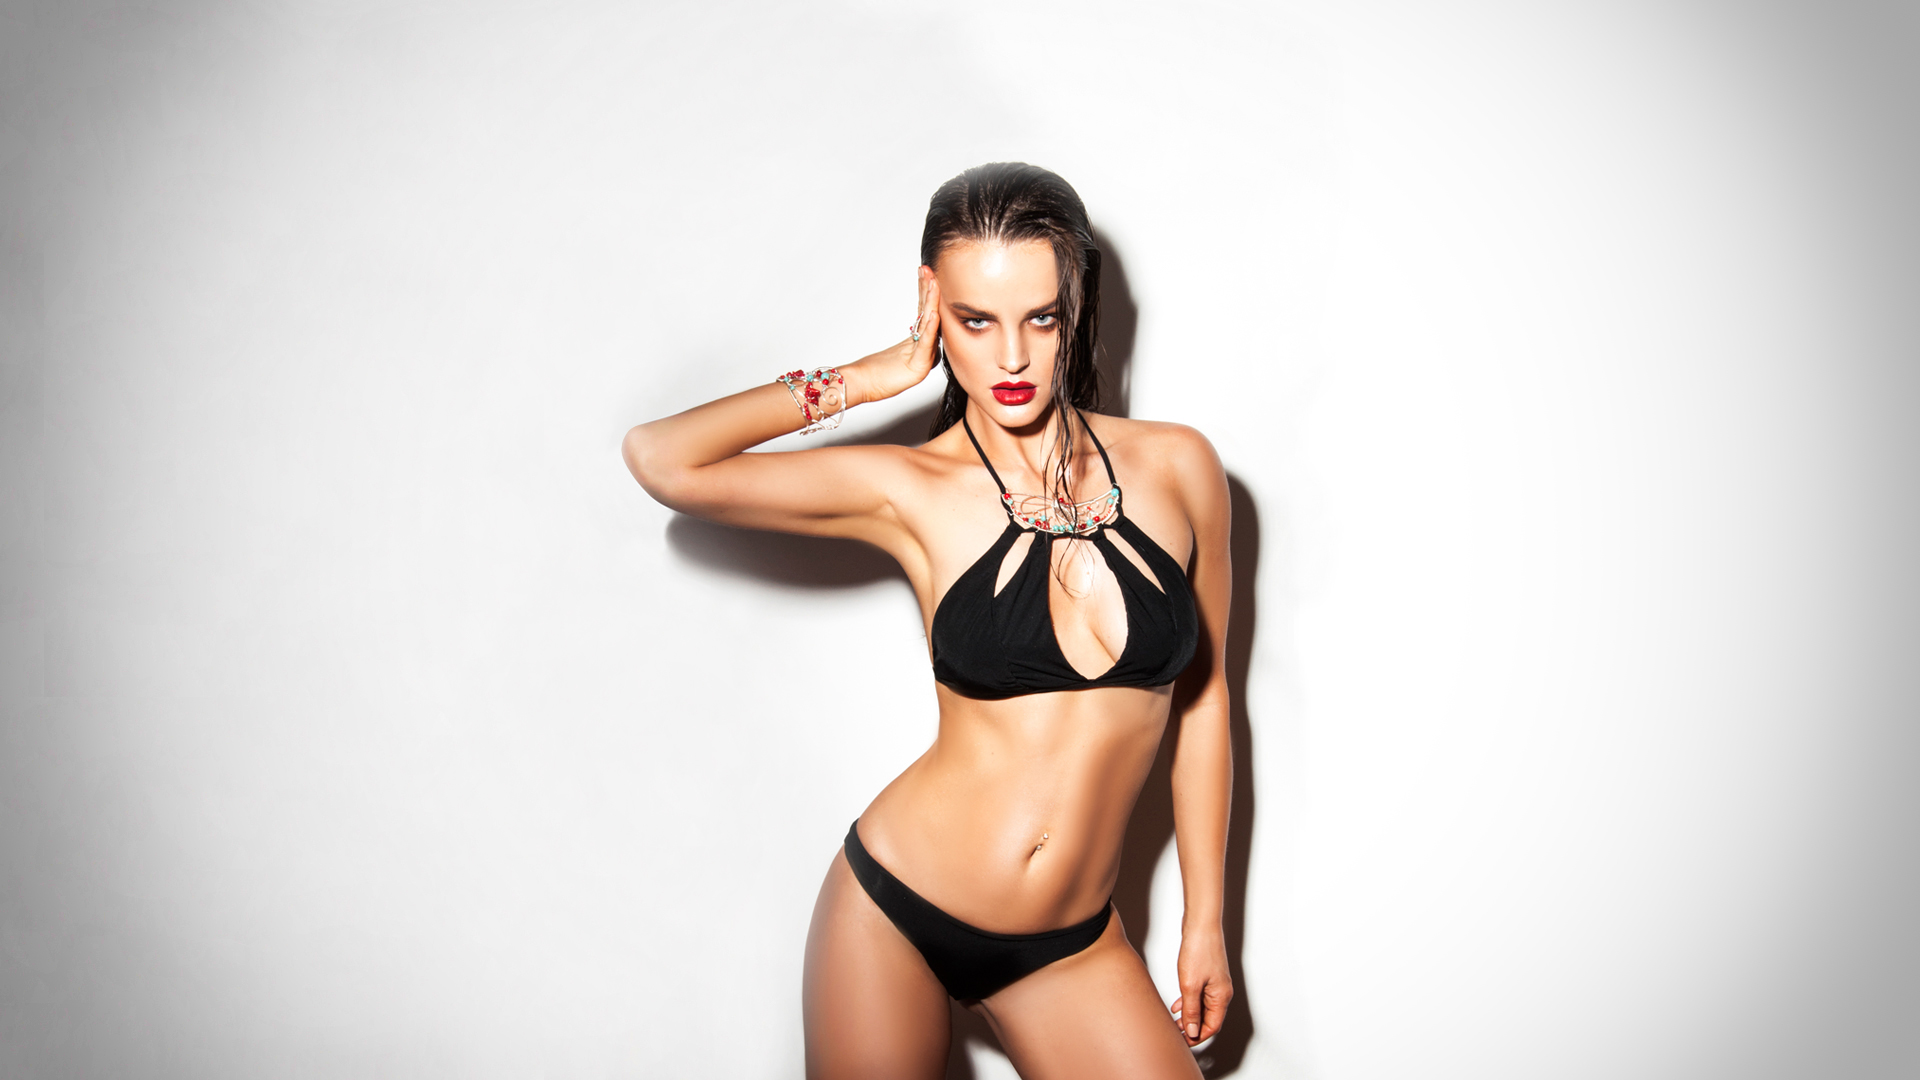 Lavishly Appointed Luxury Swimwear Brand